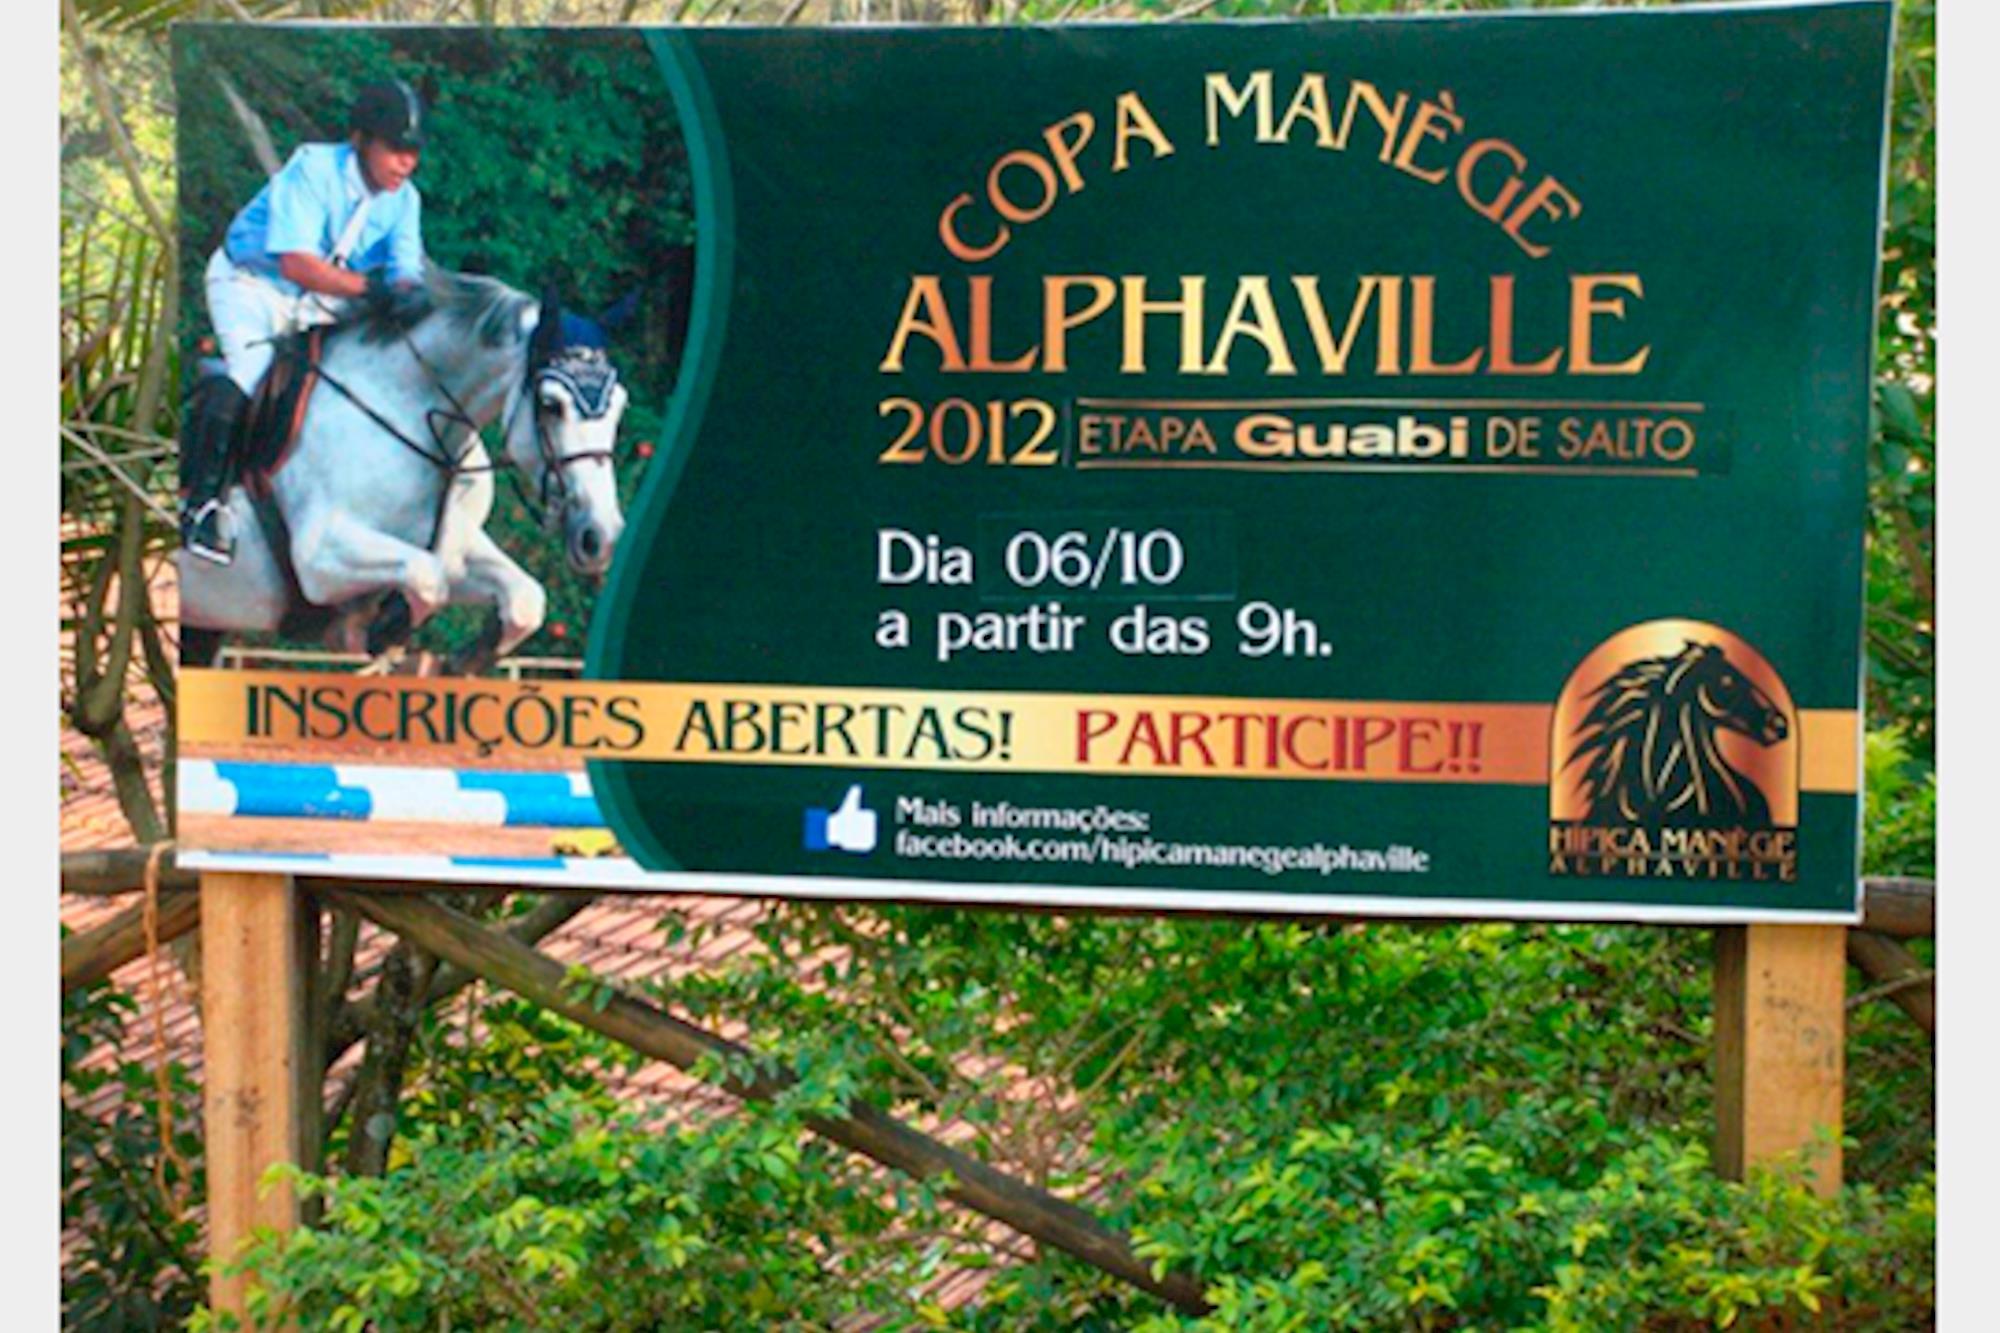 Mànege Alphaville realiza mais uma etapa